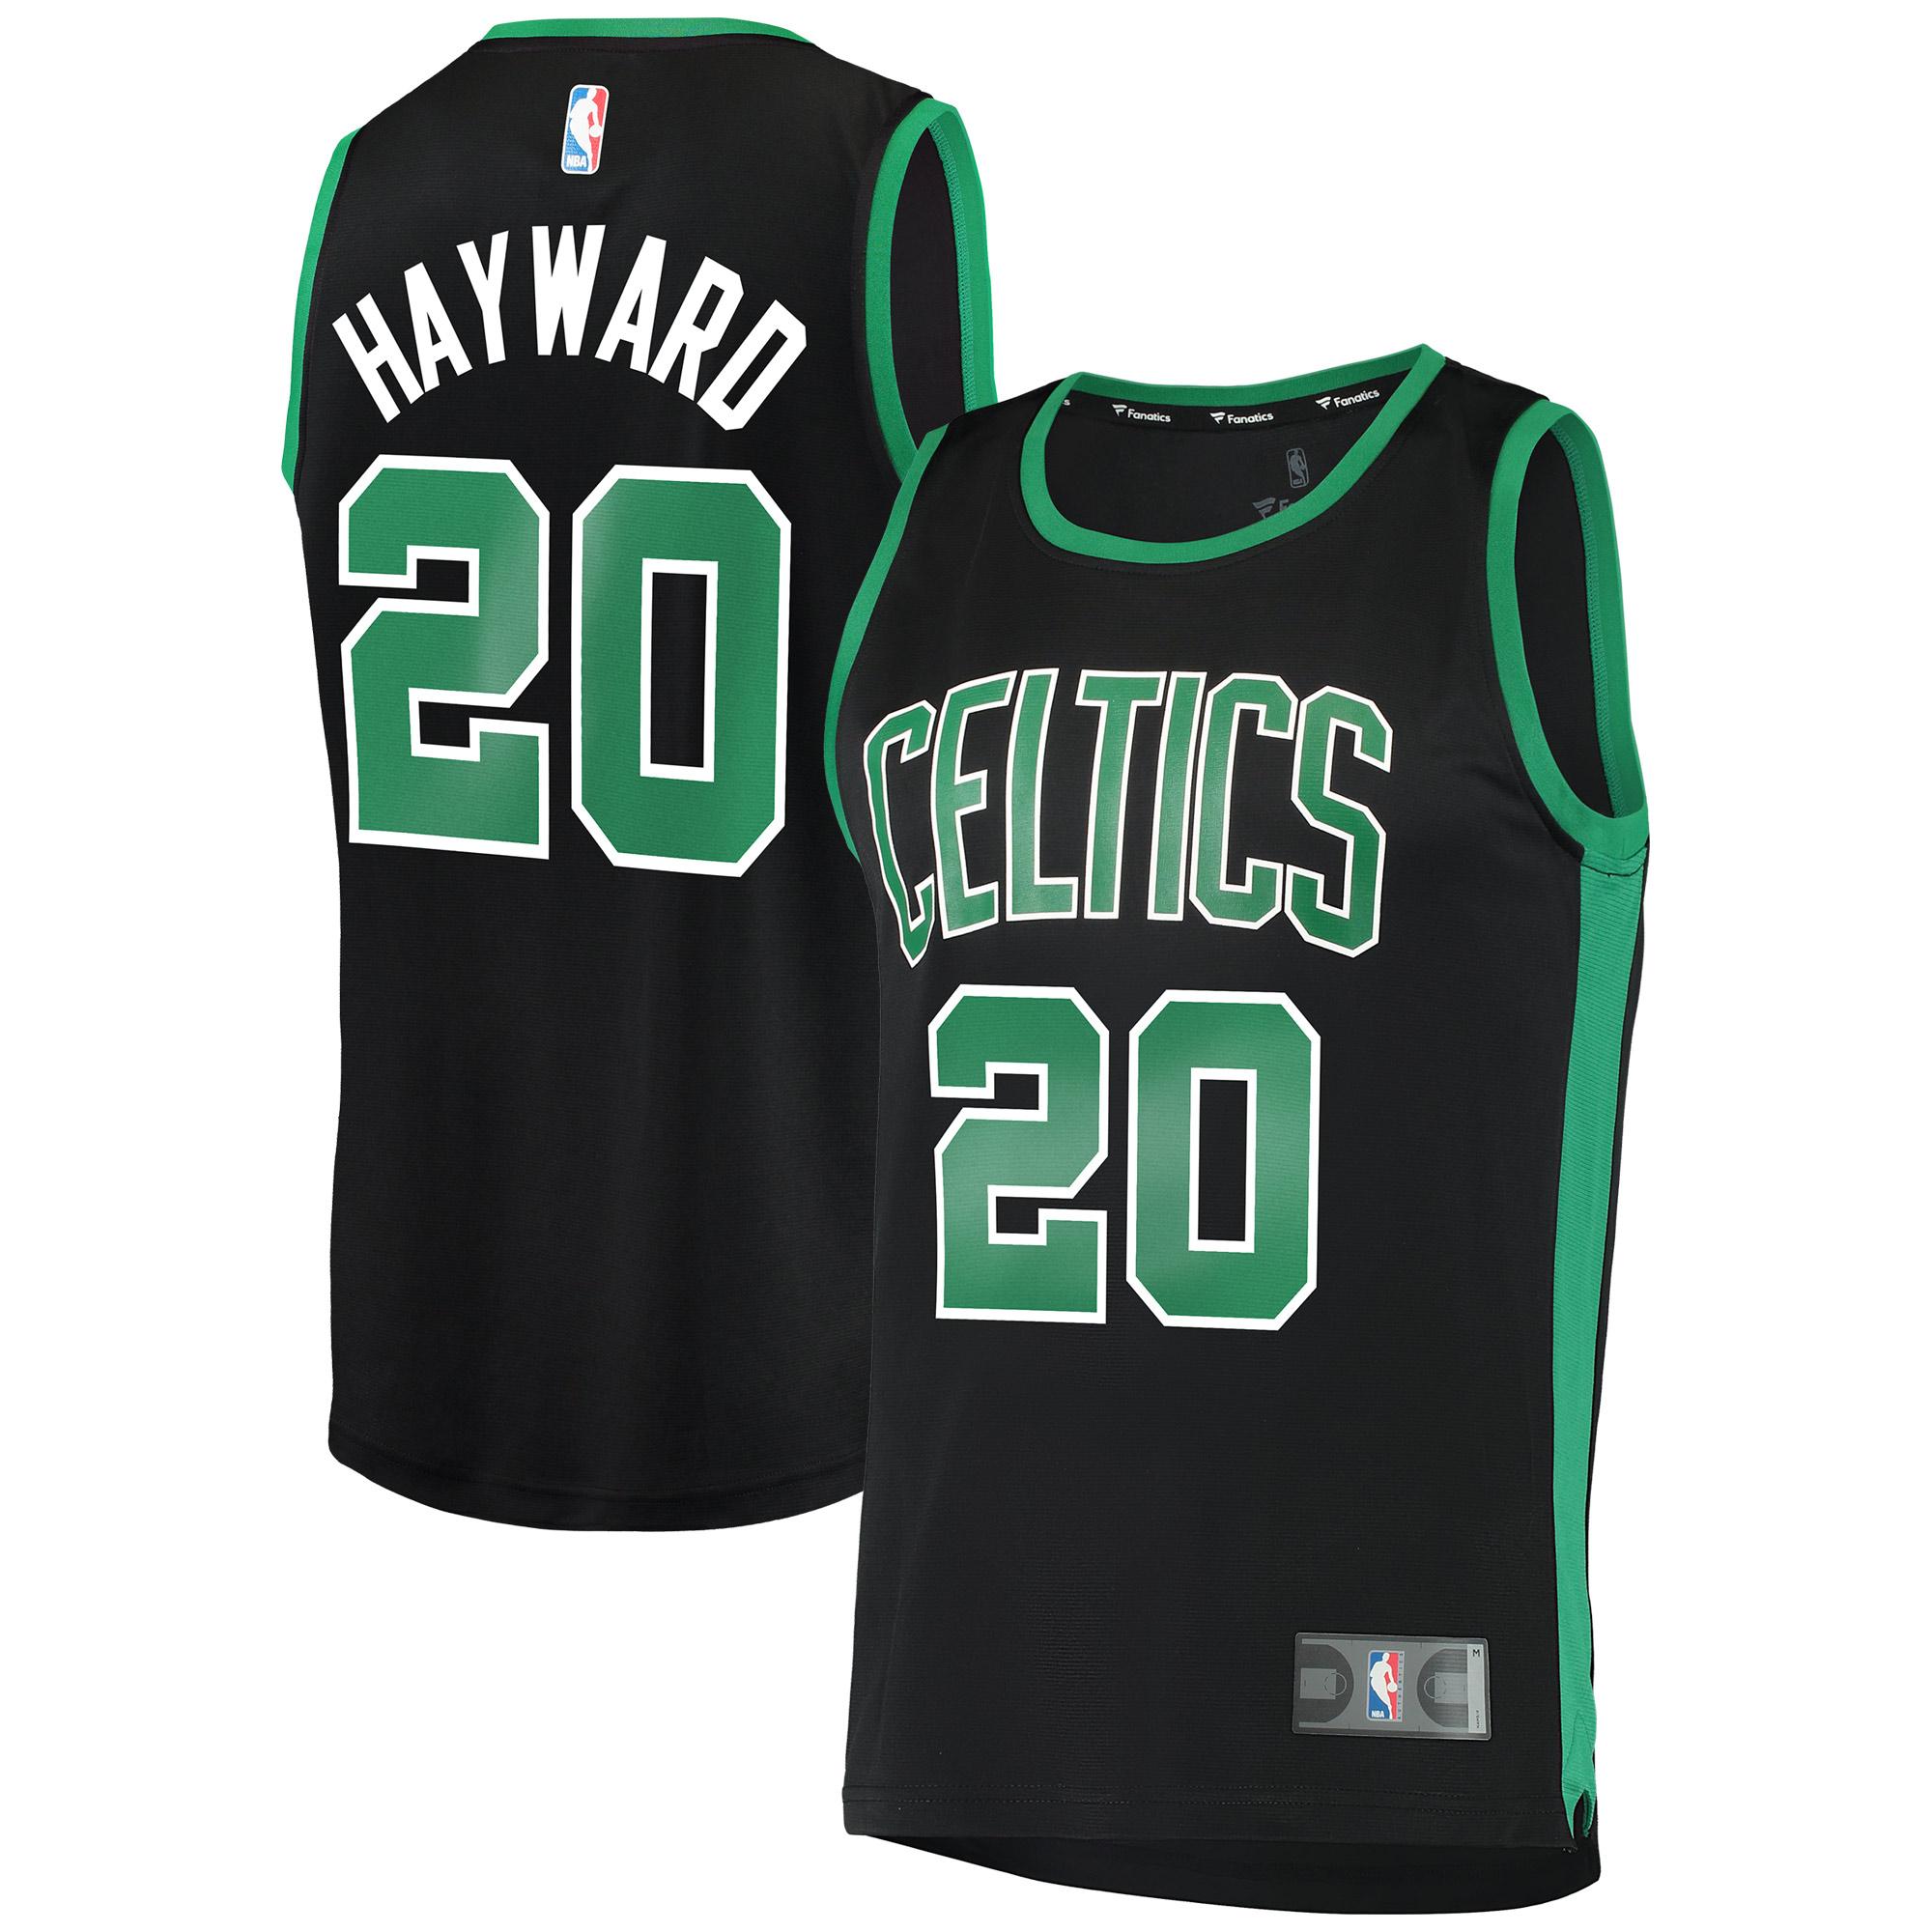 Gordon Hayward Boston Celtics Fanatics Branded Fast Break Replica Jersey Black - Statement Edition